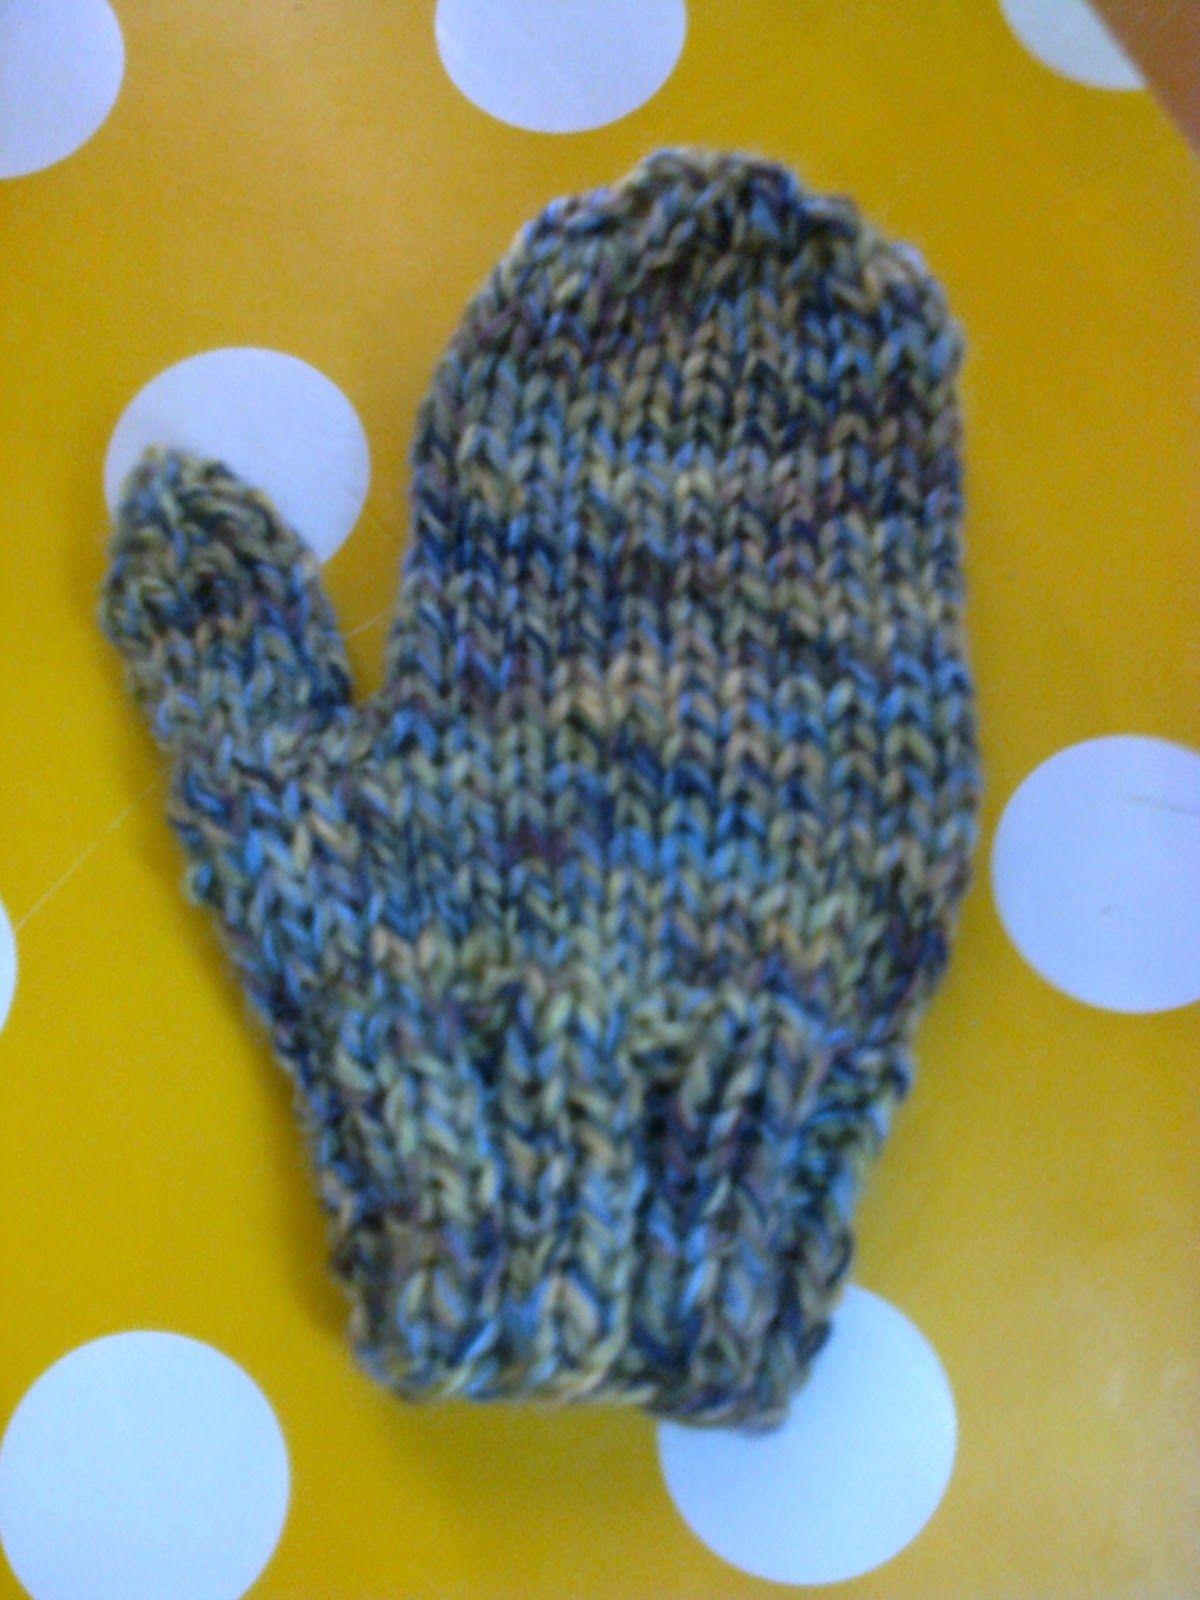 Breien En Haken In Oostende Beginners Knitting Gloves For A